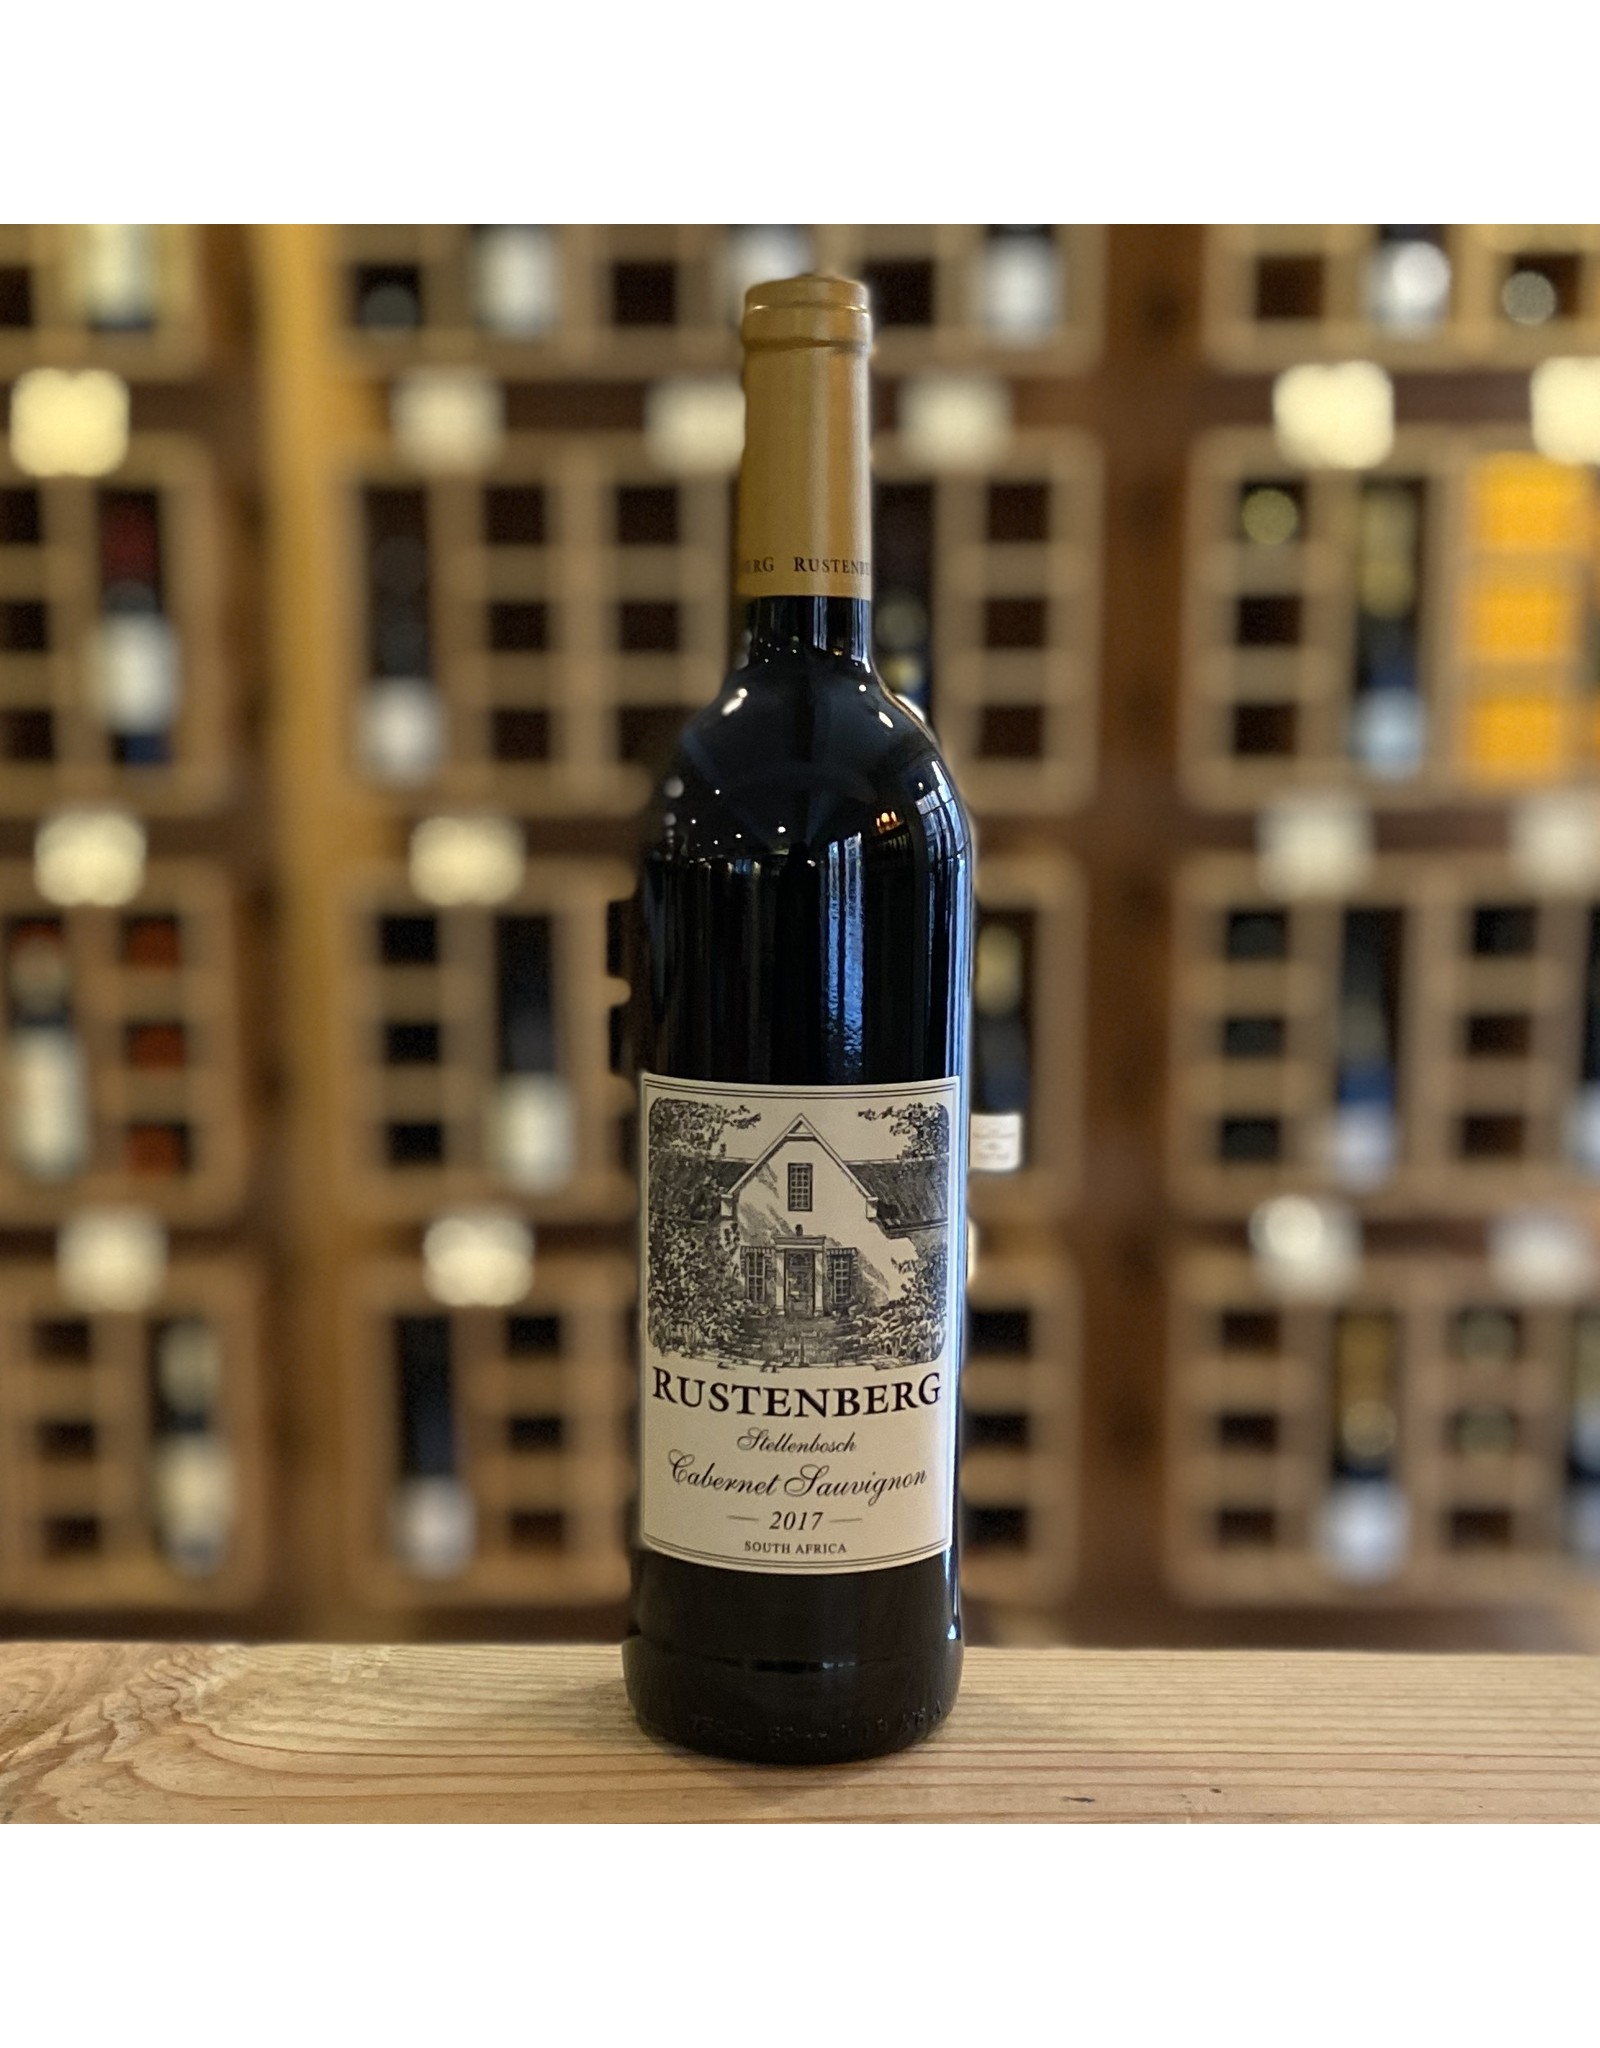 South Africa Rustenberg Winery Cabernet Sauvignon 2017 - Stellenbosch, South Africa